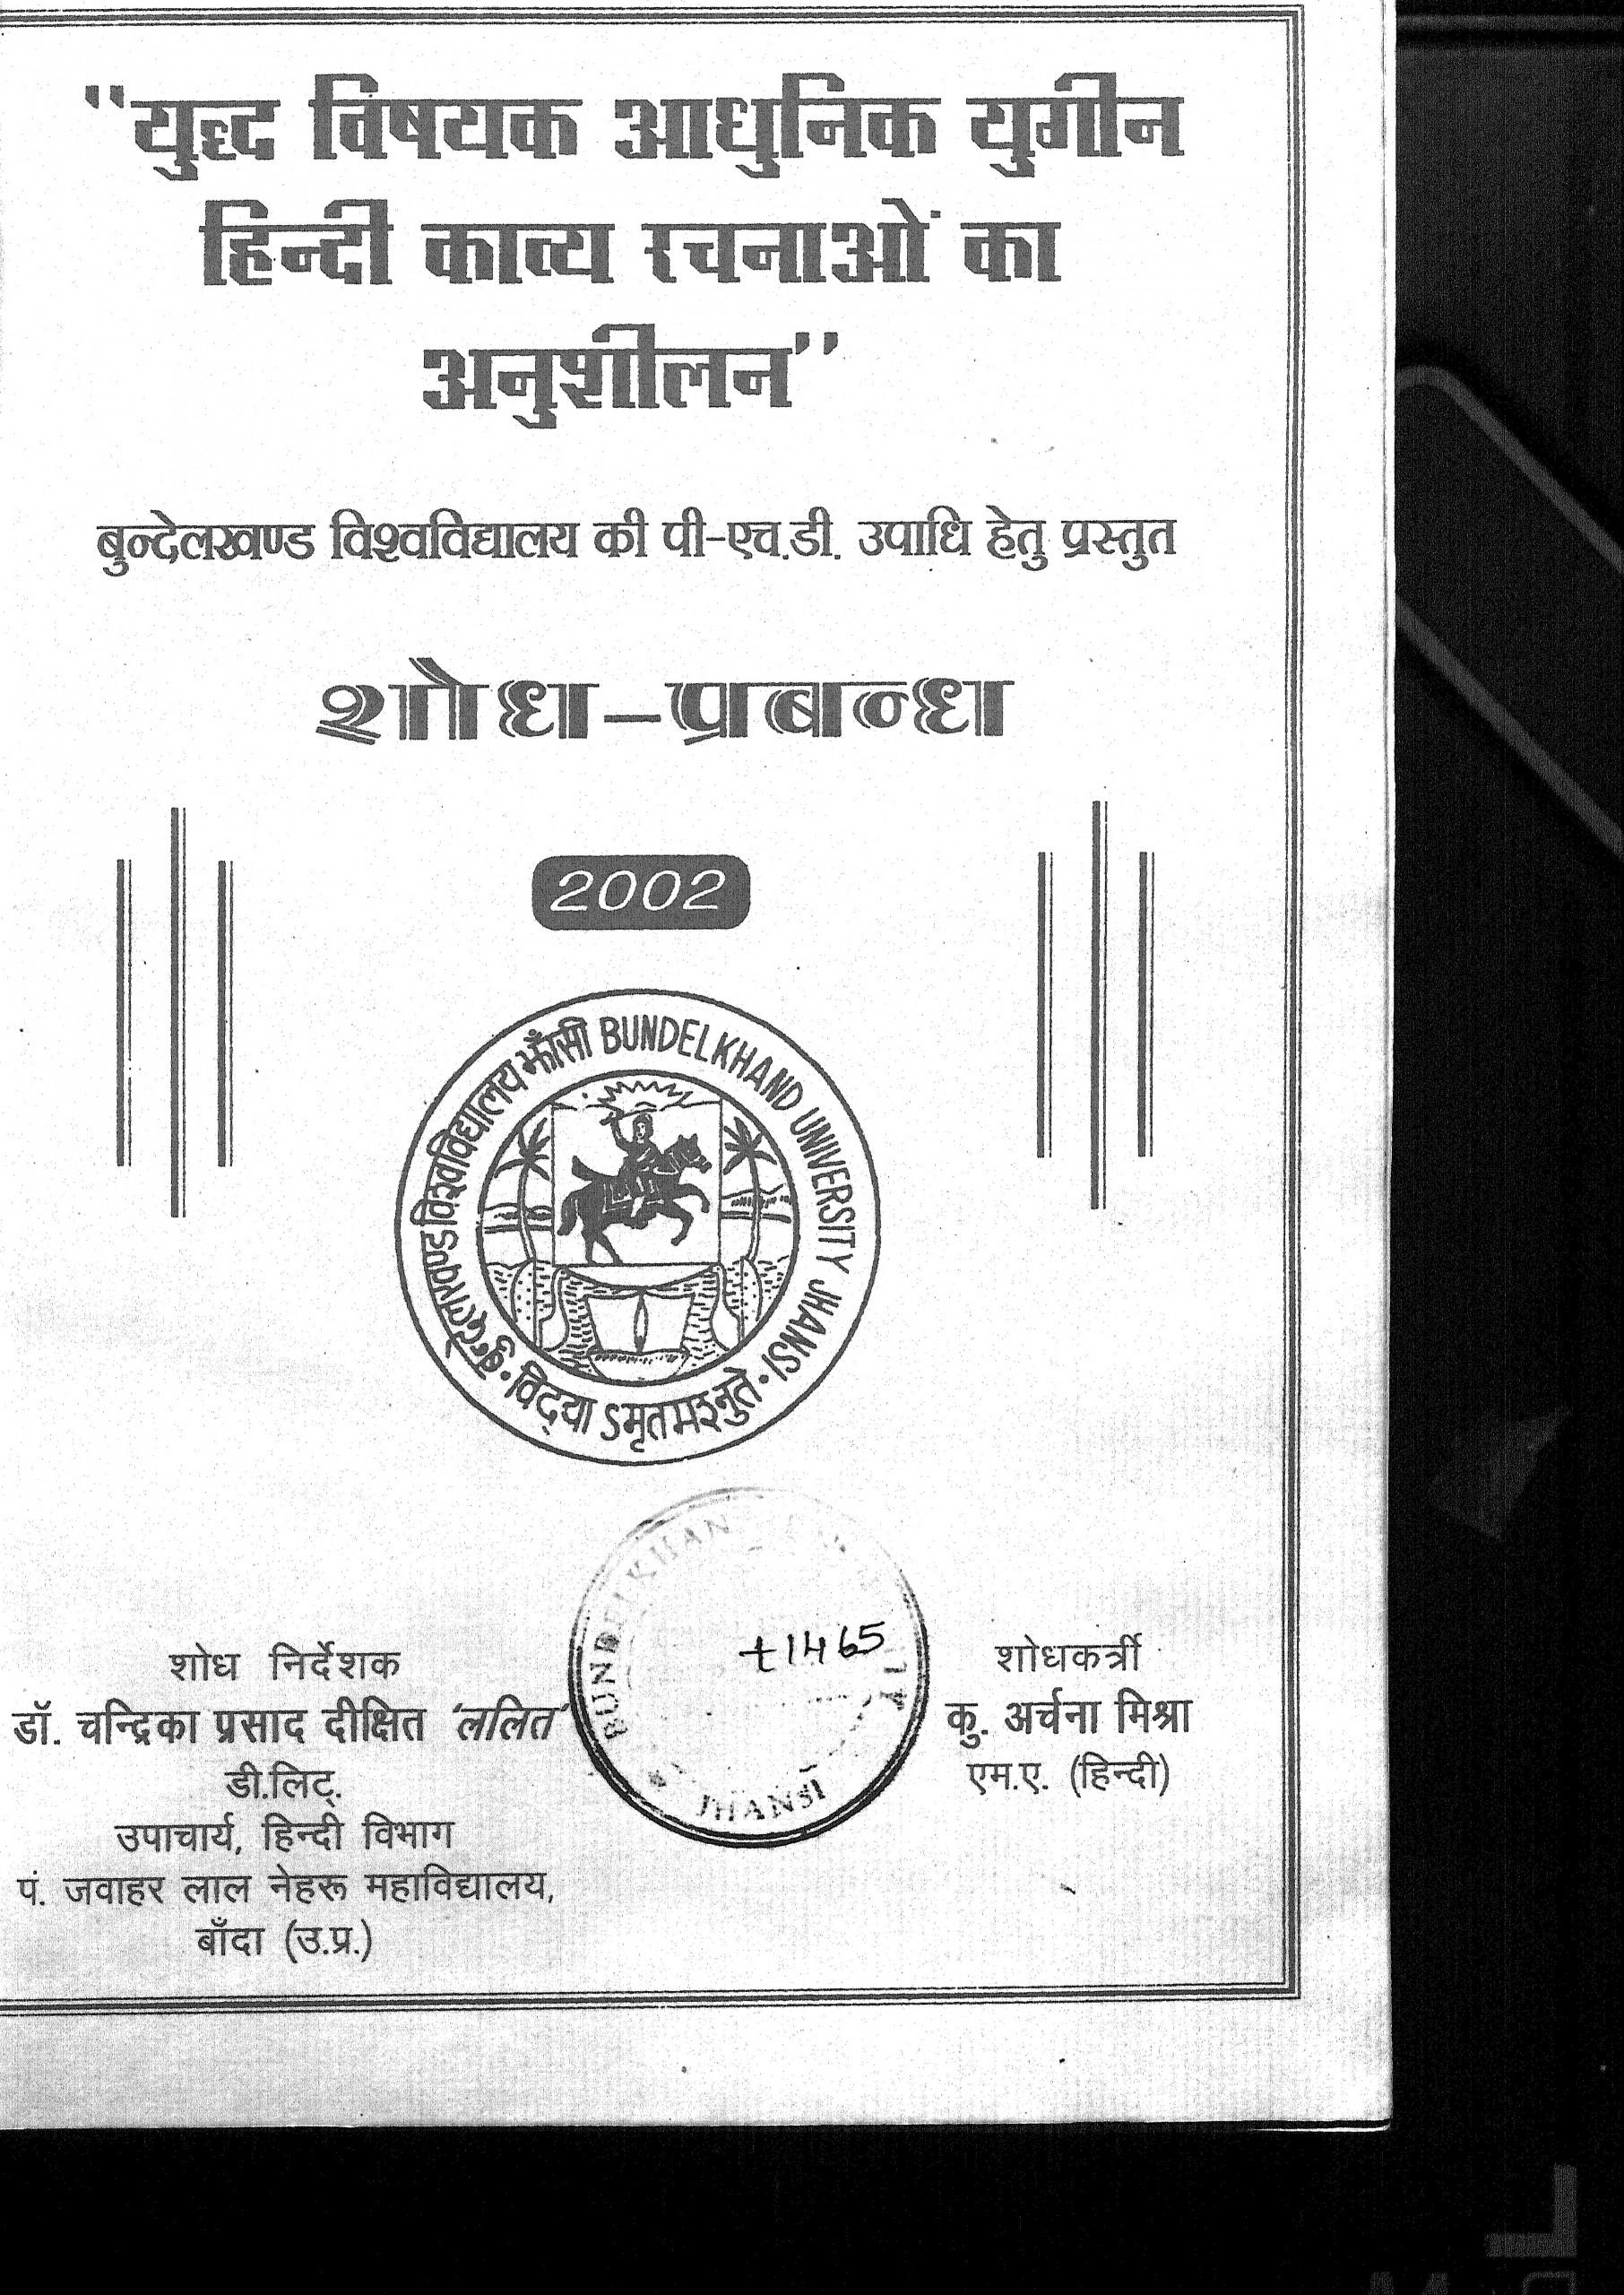 Book Image : युद्ध विषयक आधुनिक युगीन हिन्दी काव्य रचनाओं का अनुशीलन - Yuddh Vishayak Adhunik Yugeen Hindi Kavya Rachanaon Ka Anuseelan